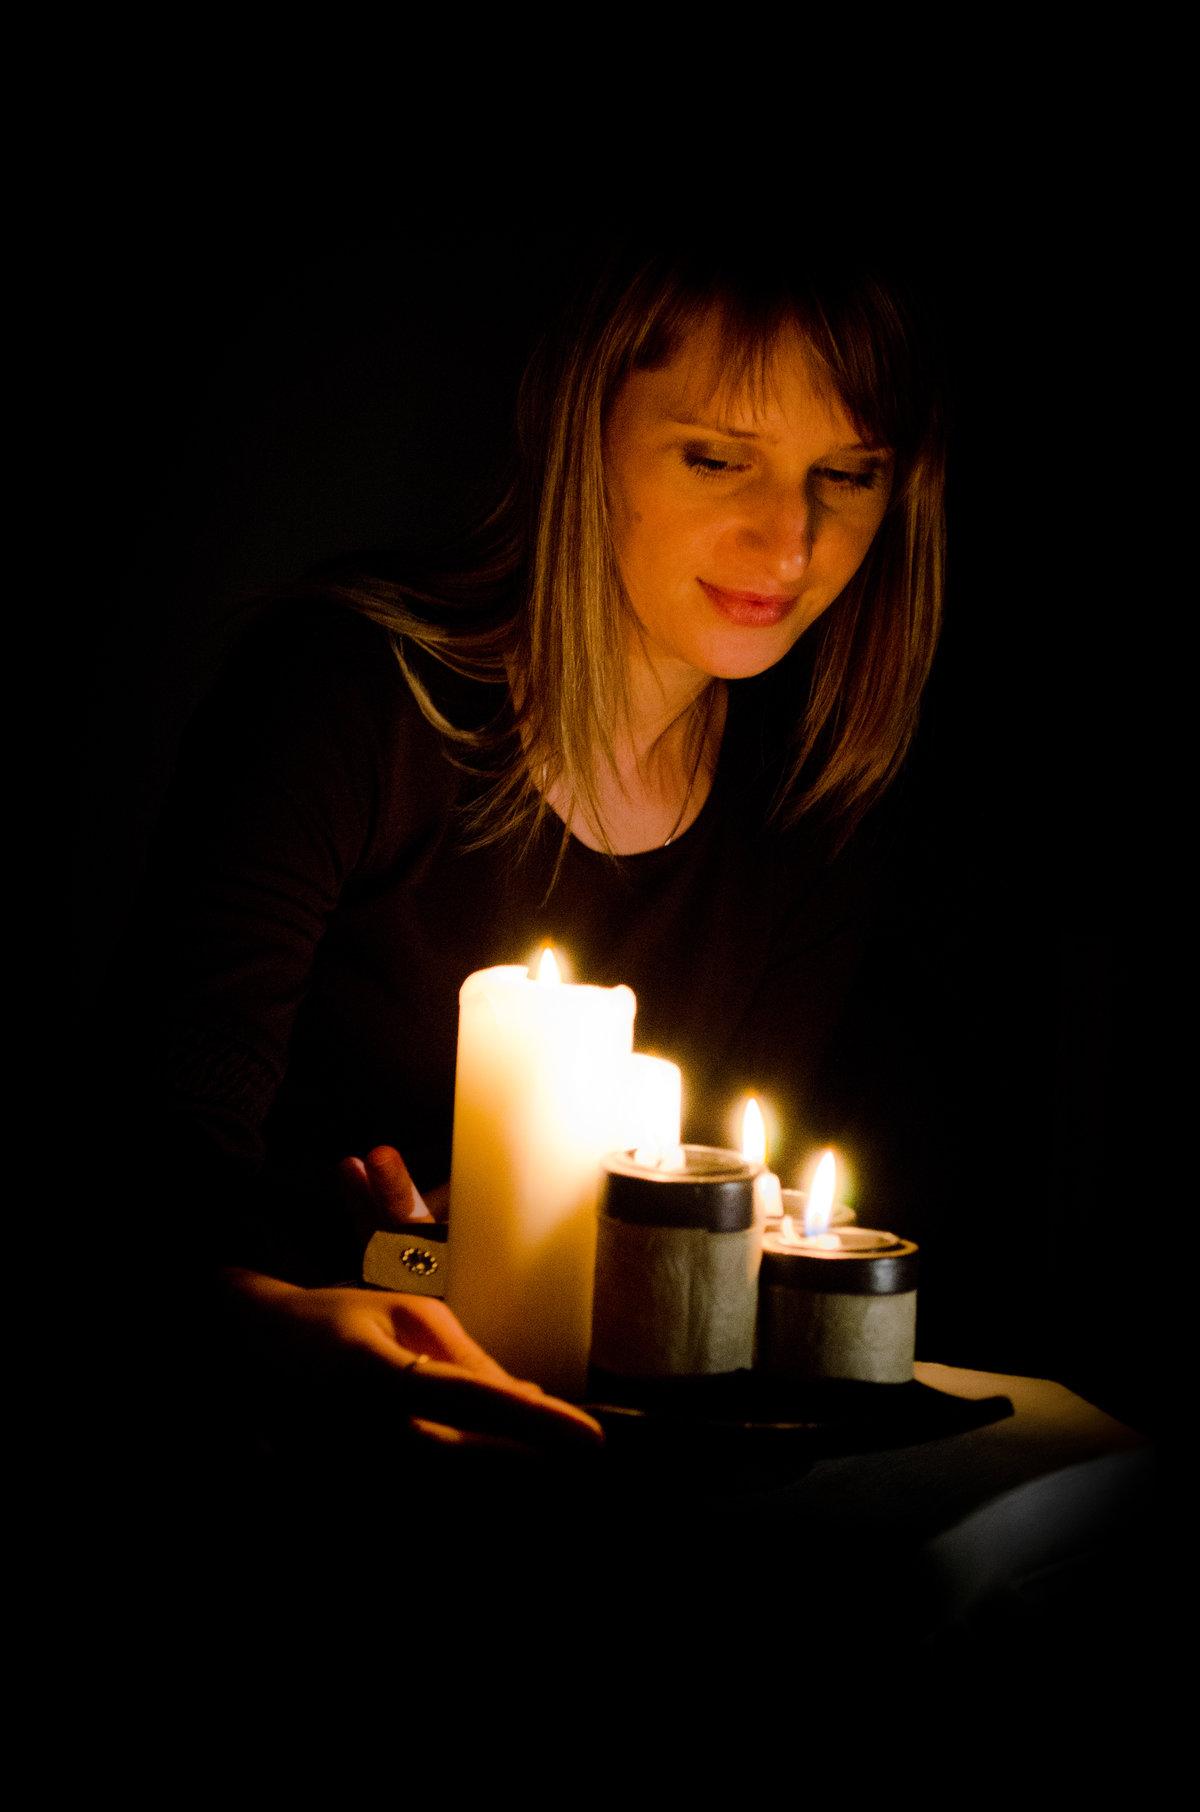 Девушка при свечах картинка